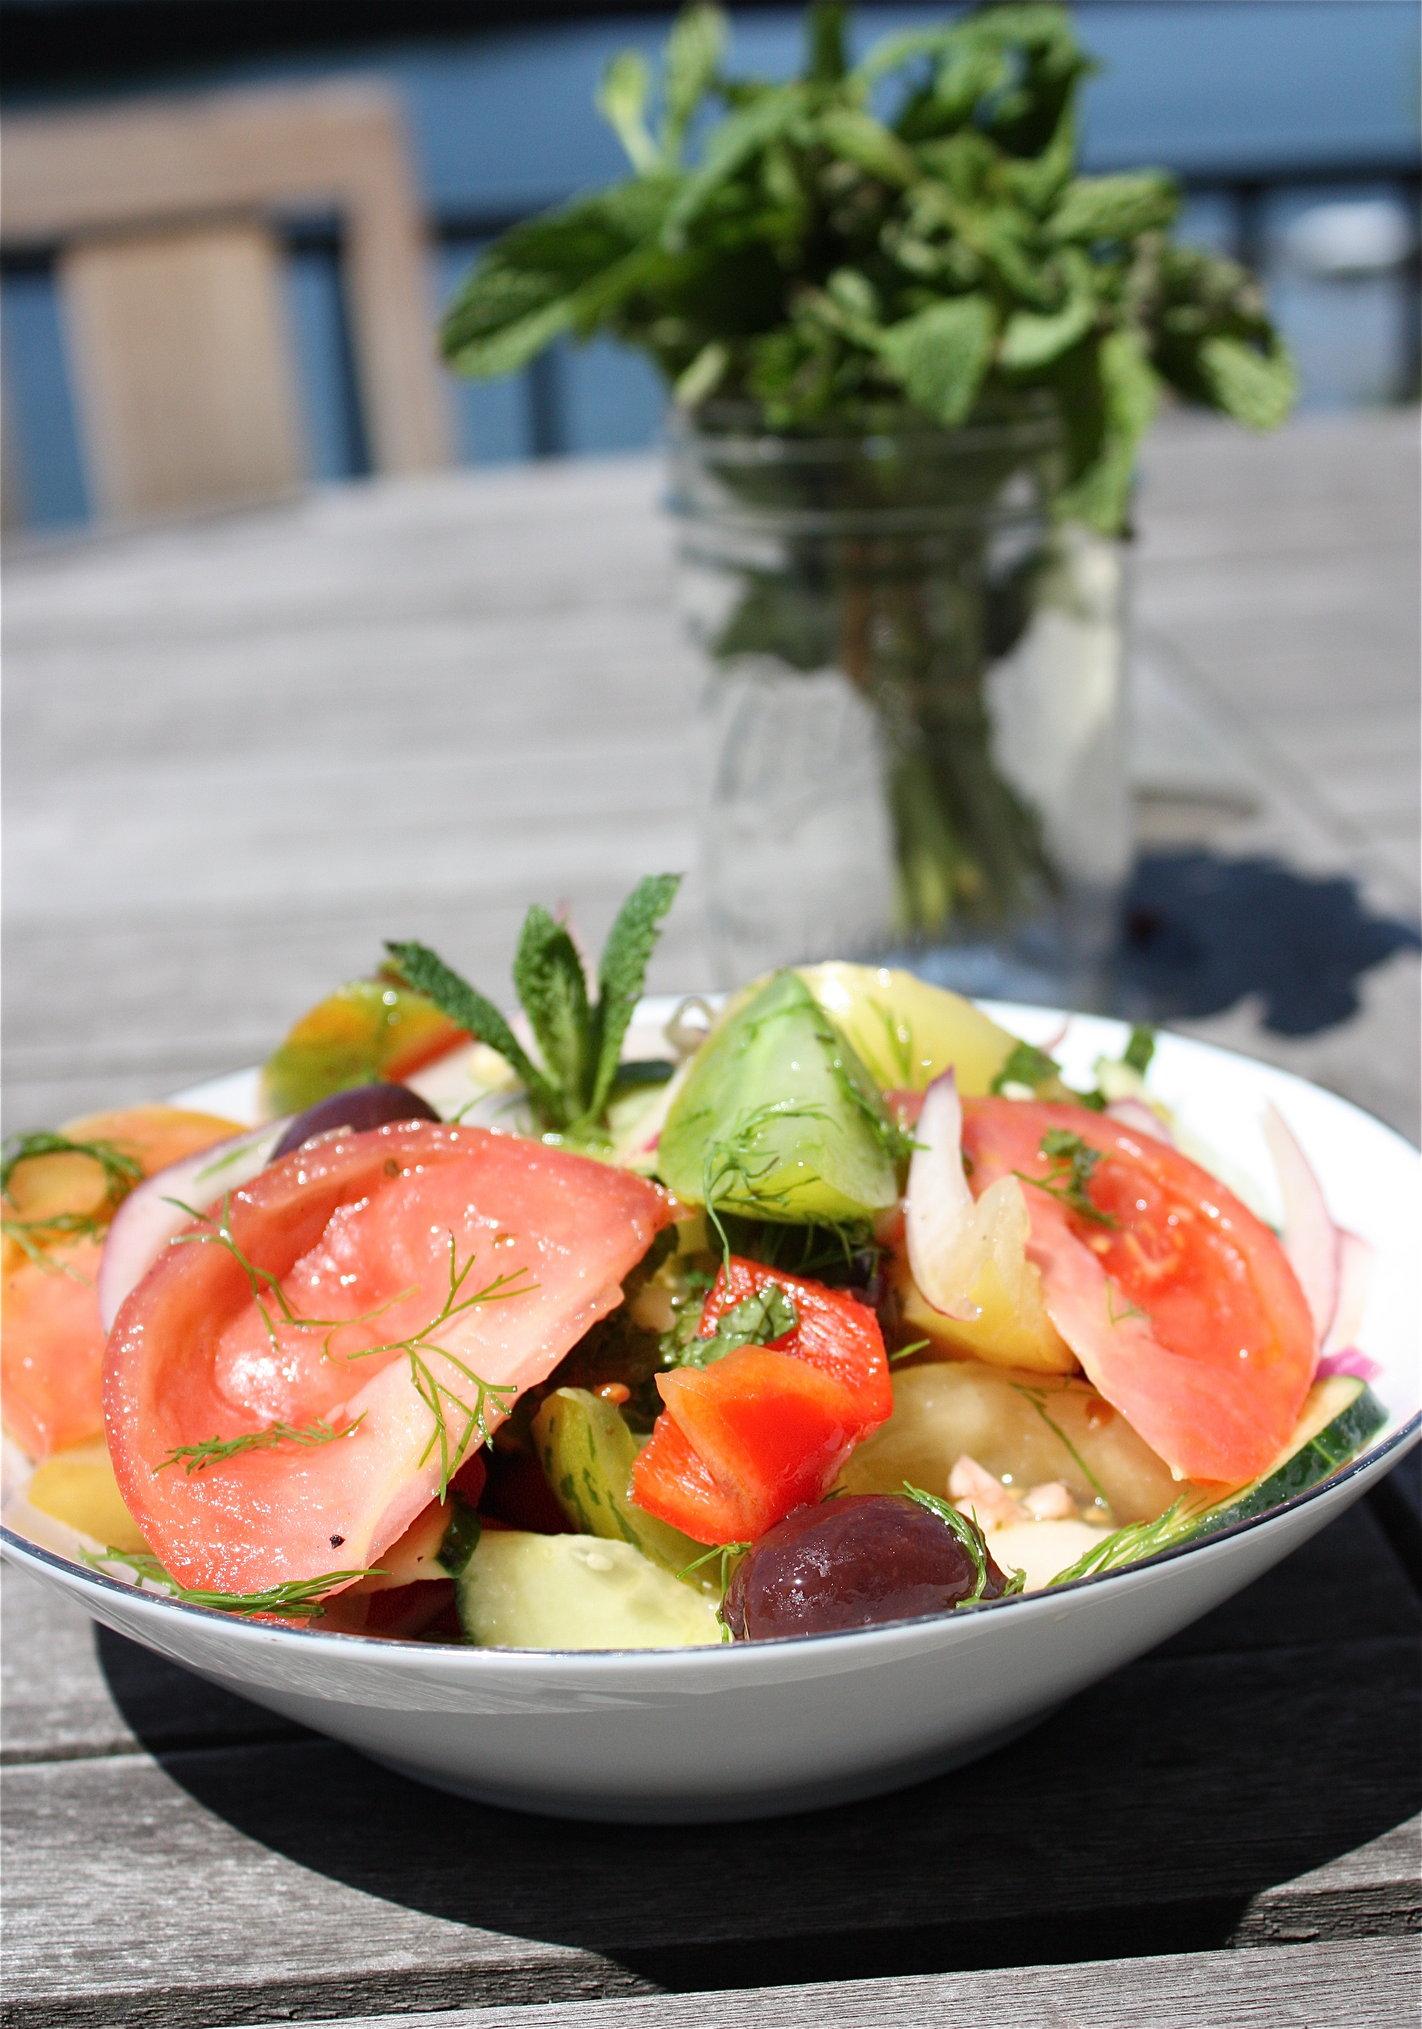 Michael Symon's Summery Tomato Salad